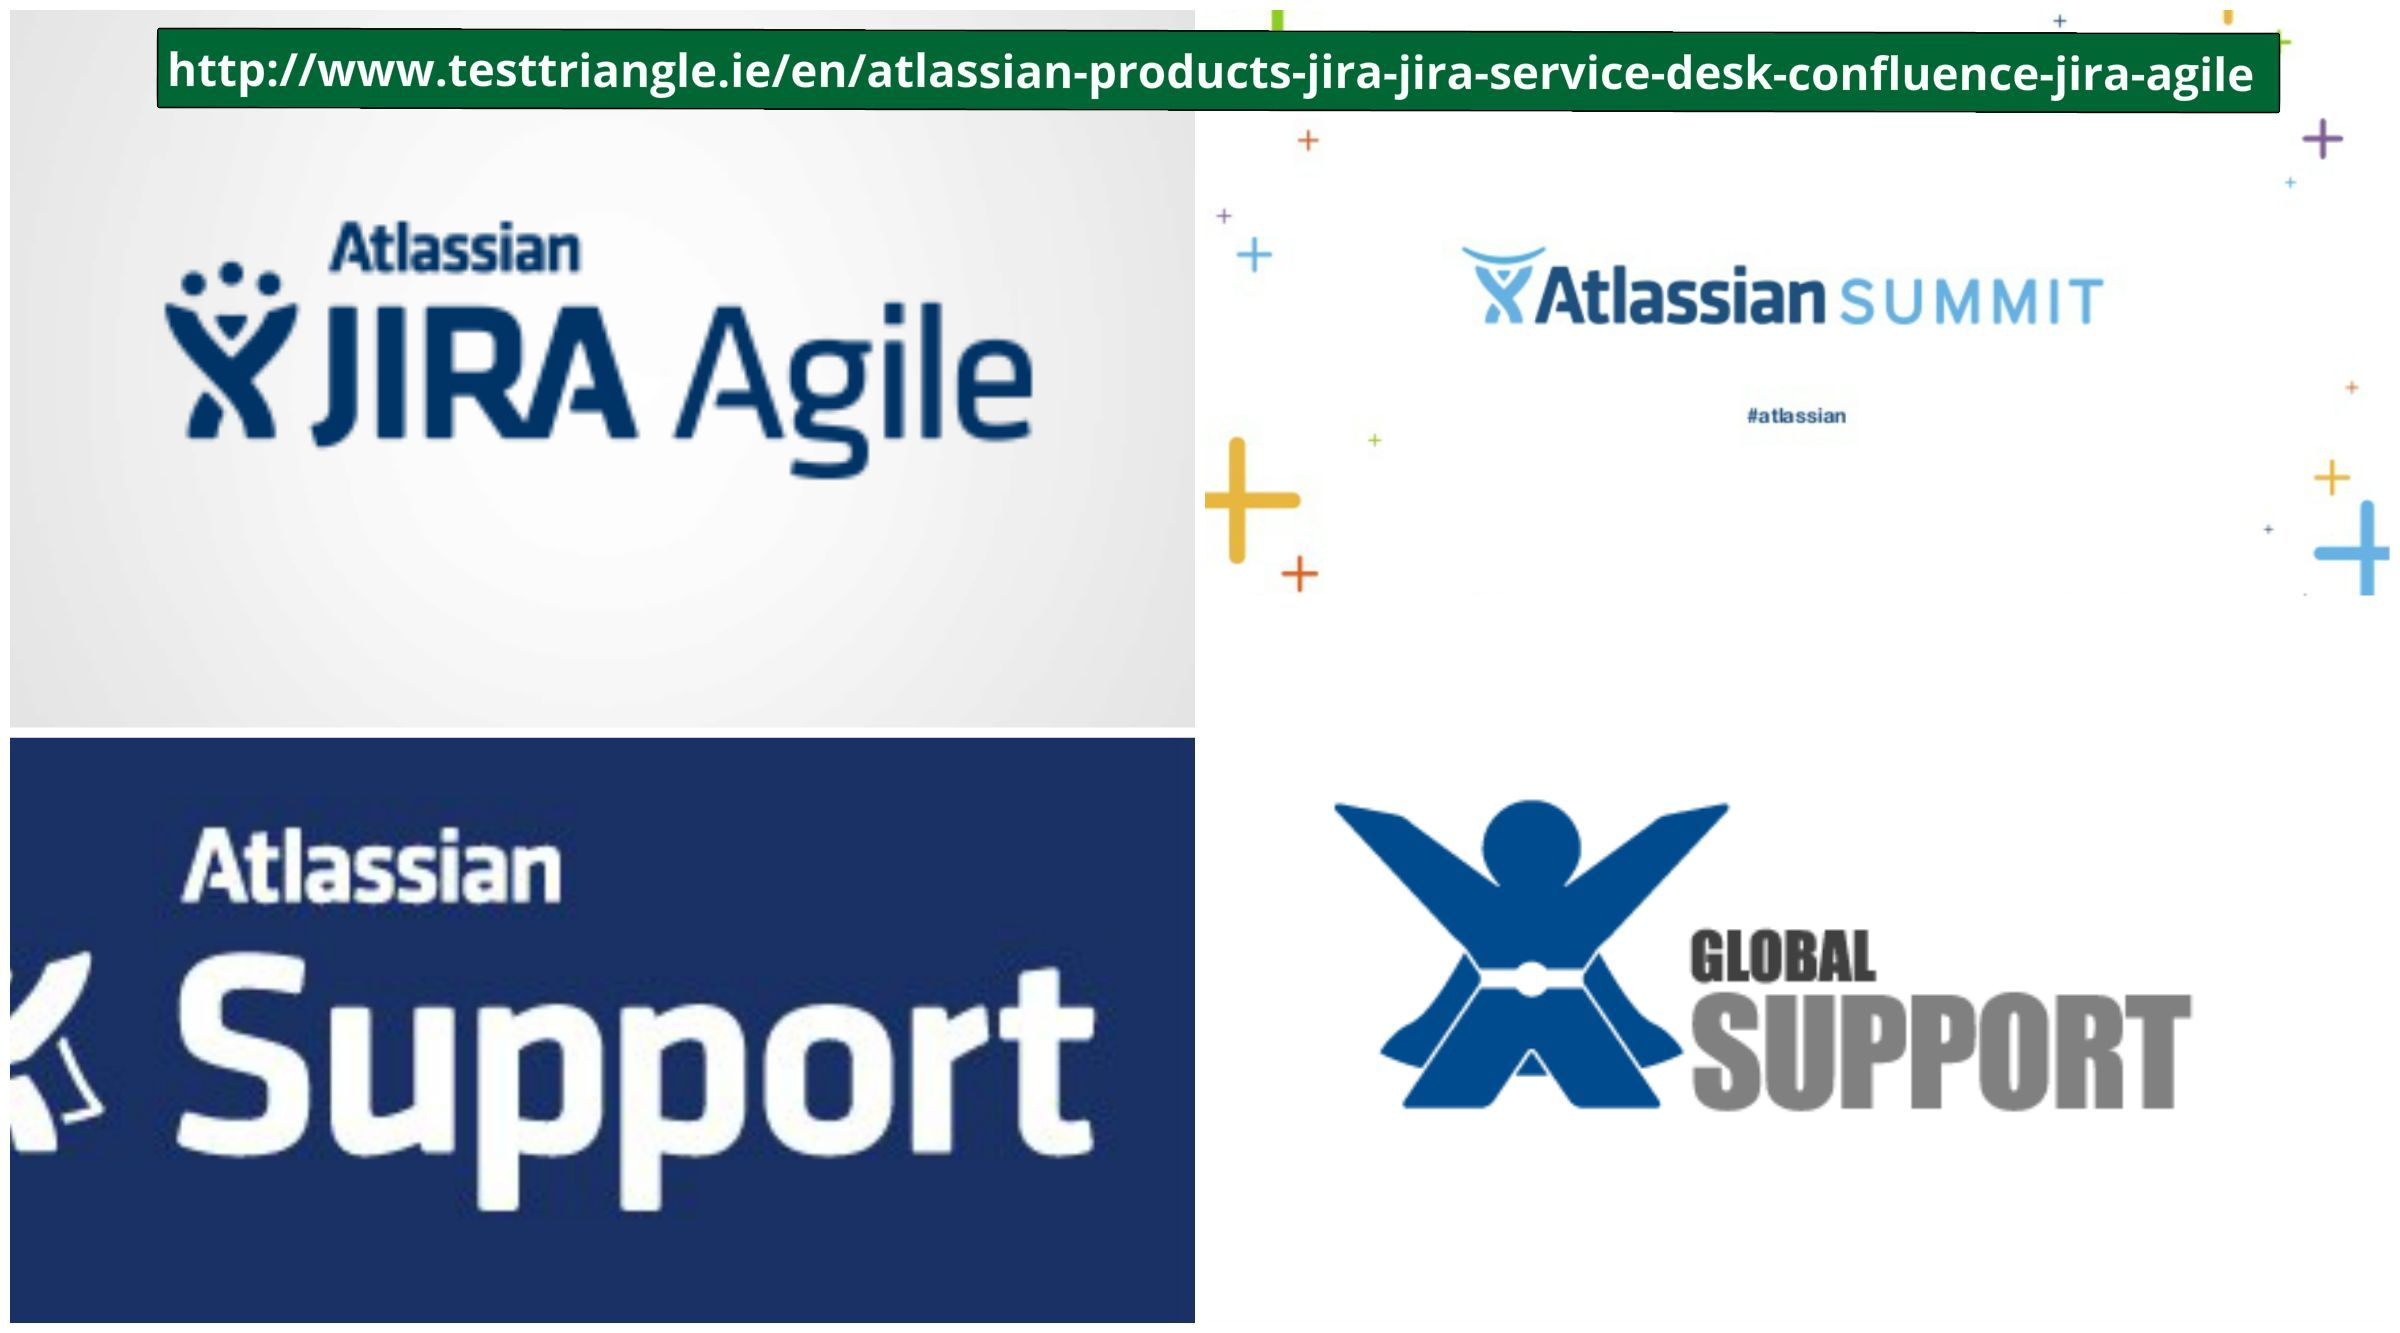 Http Www Testtriangle Ie En Atlassian Products Jira Jira Service Desk Confluence Jira Agile Atlassian Support Help Problem Solving Supportive Software Design